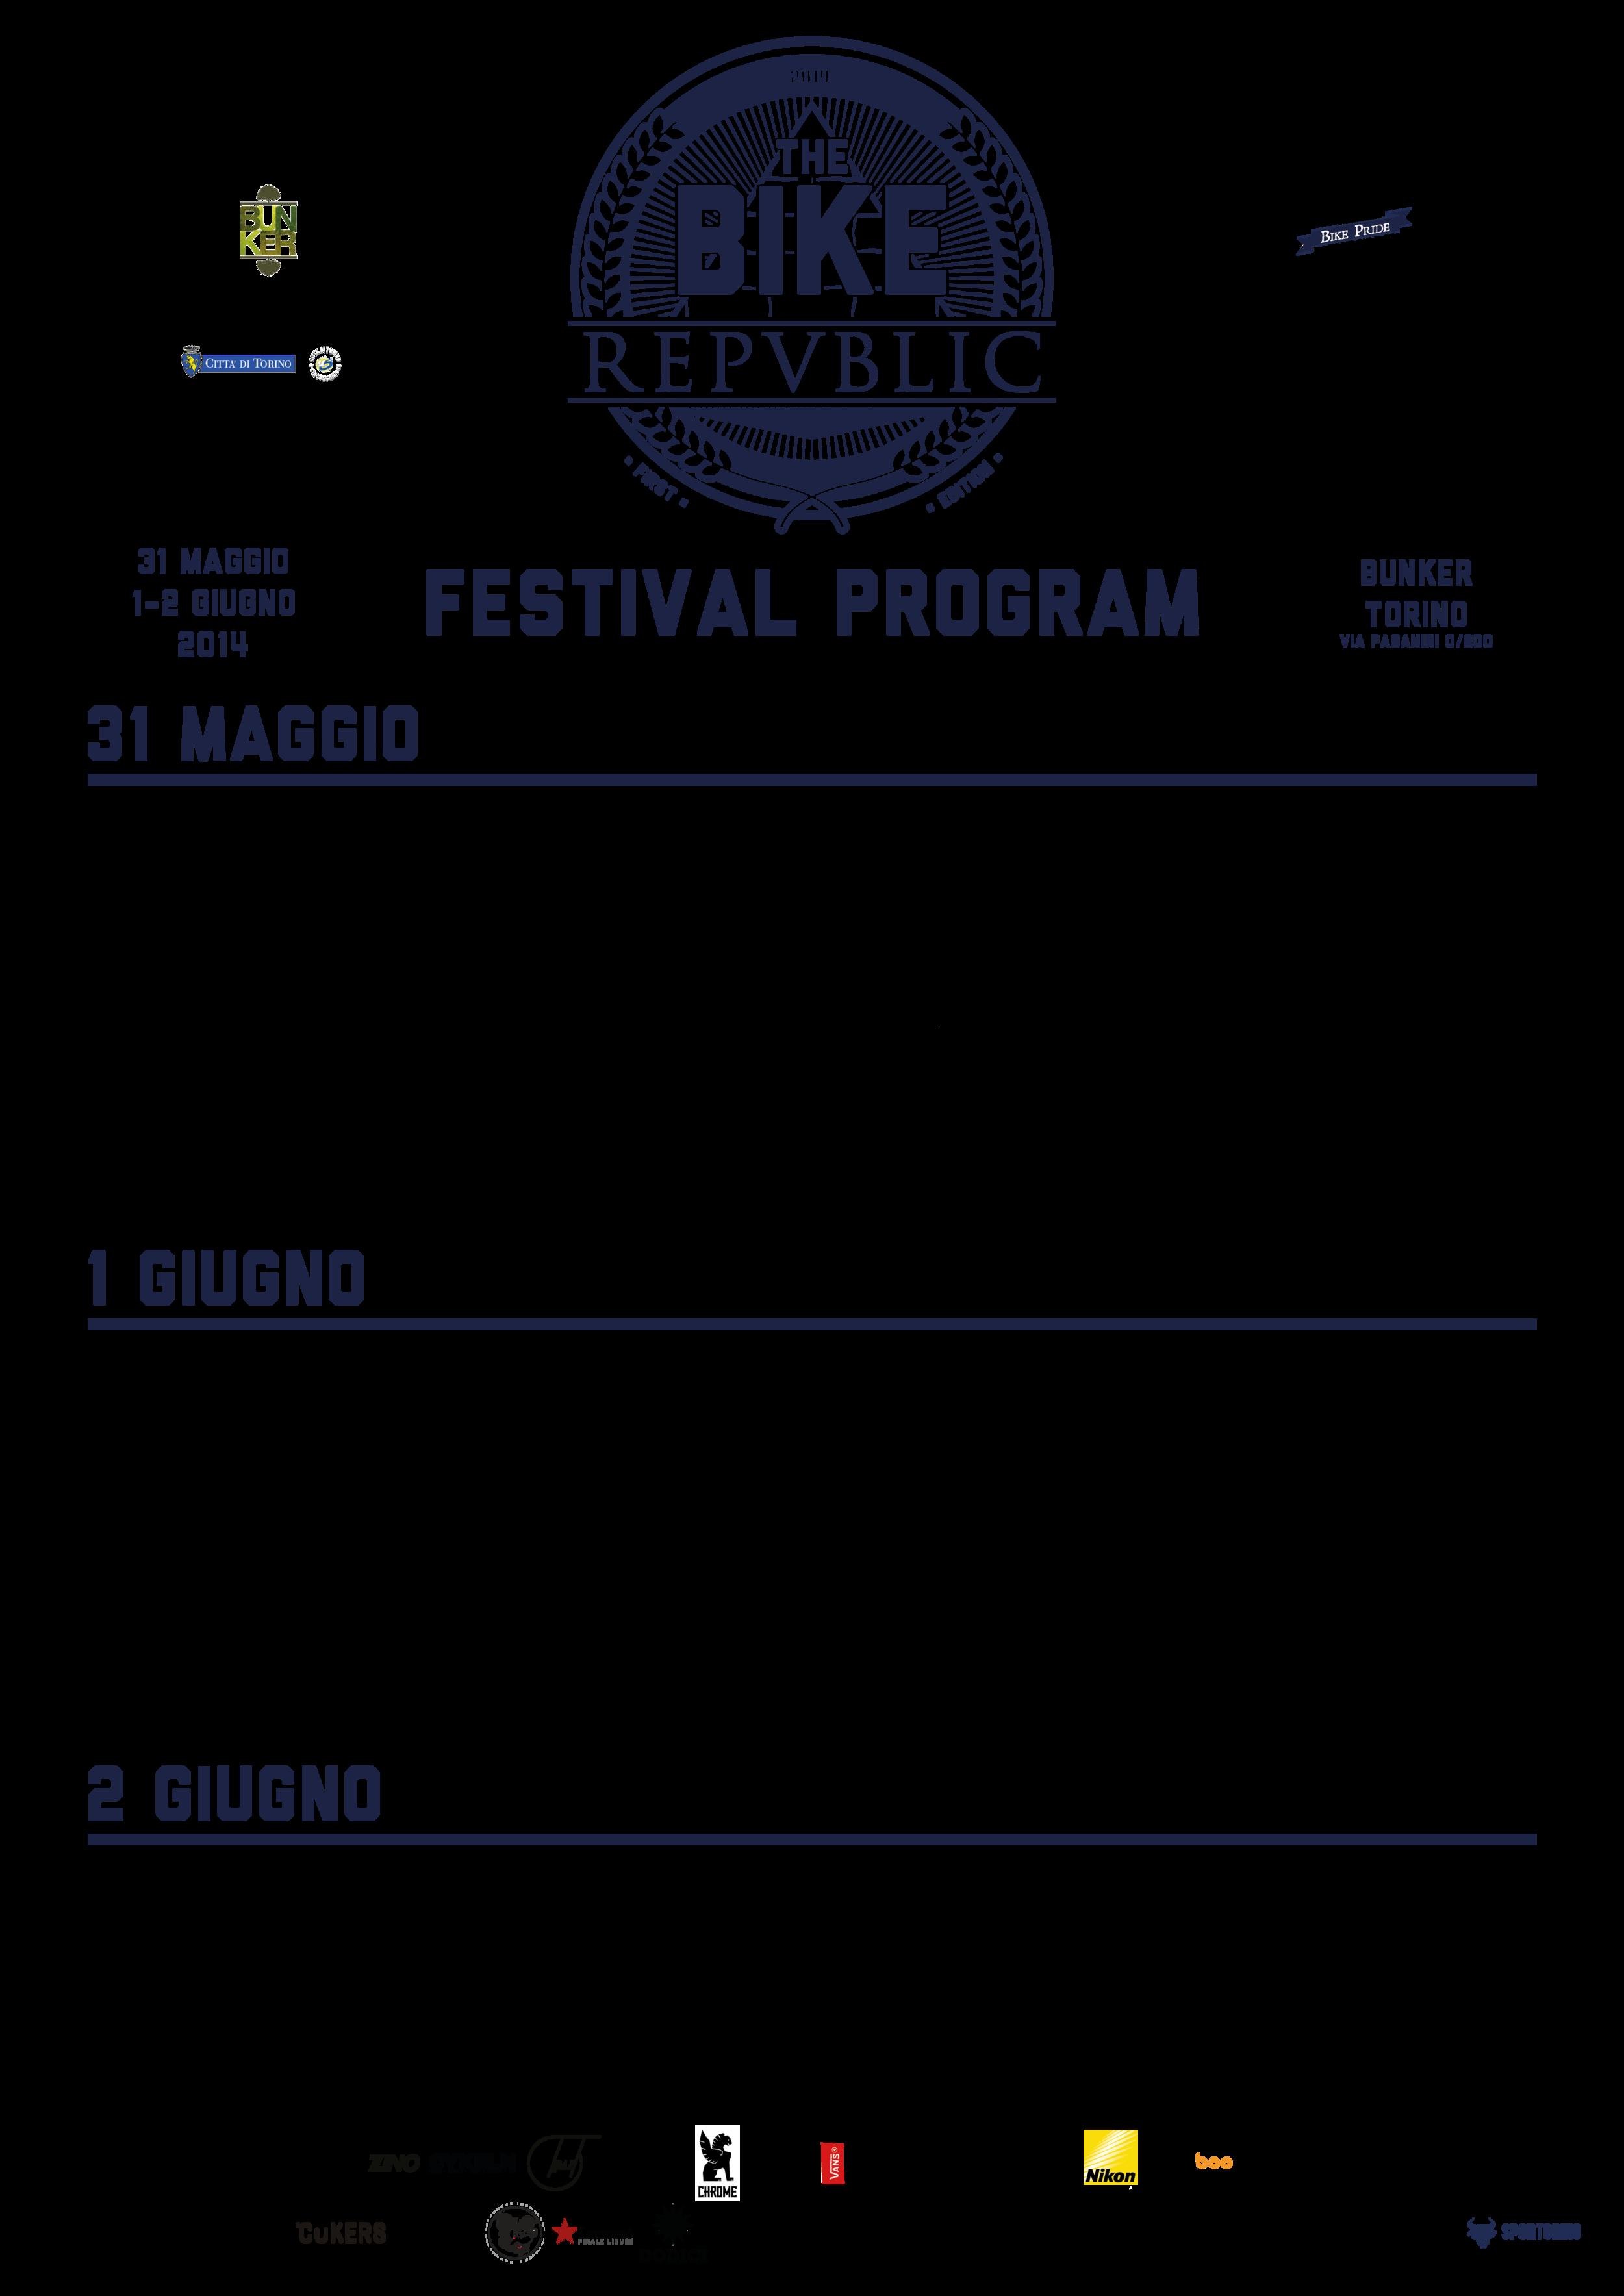 The-Bike-Republic-Festival-program-A3-01.png